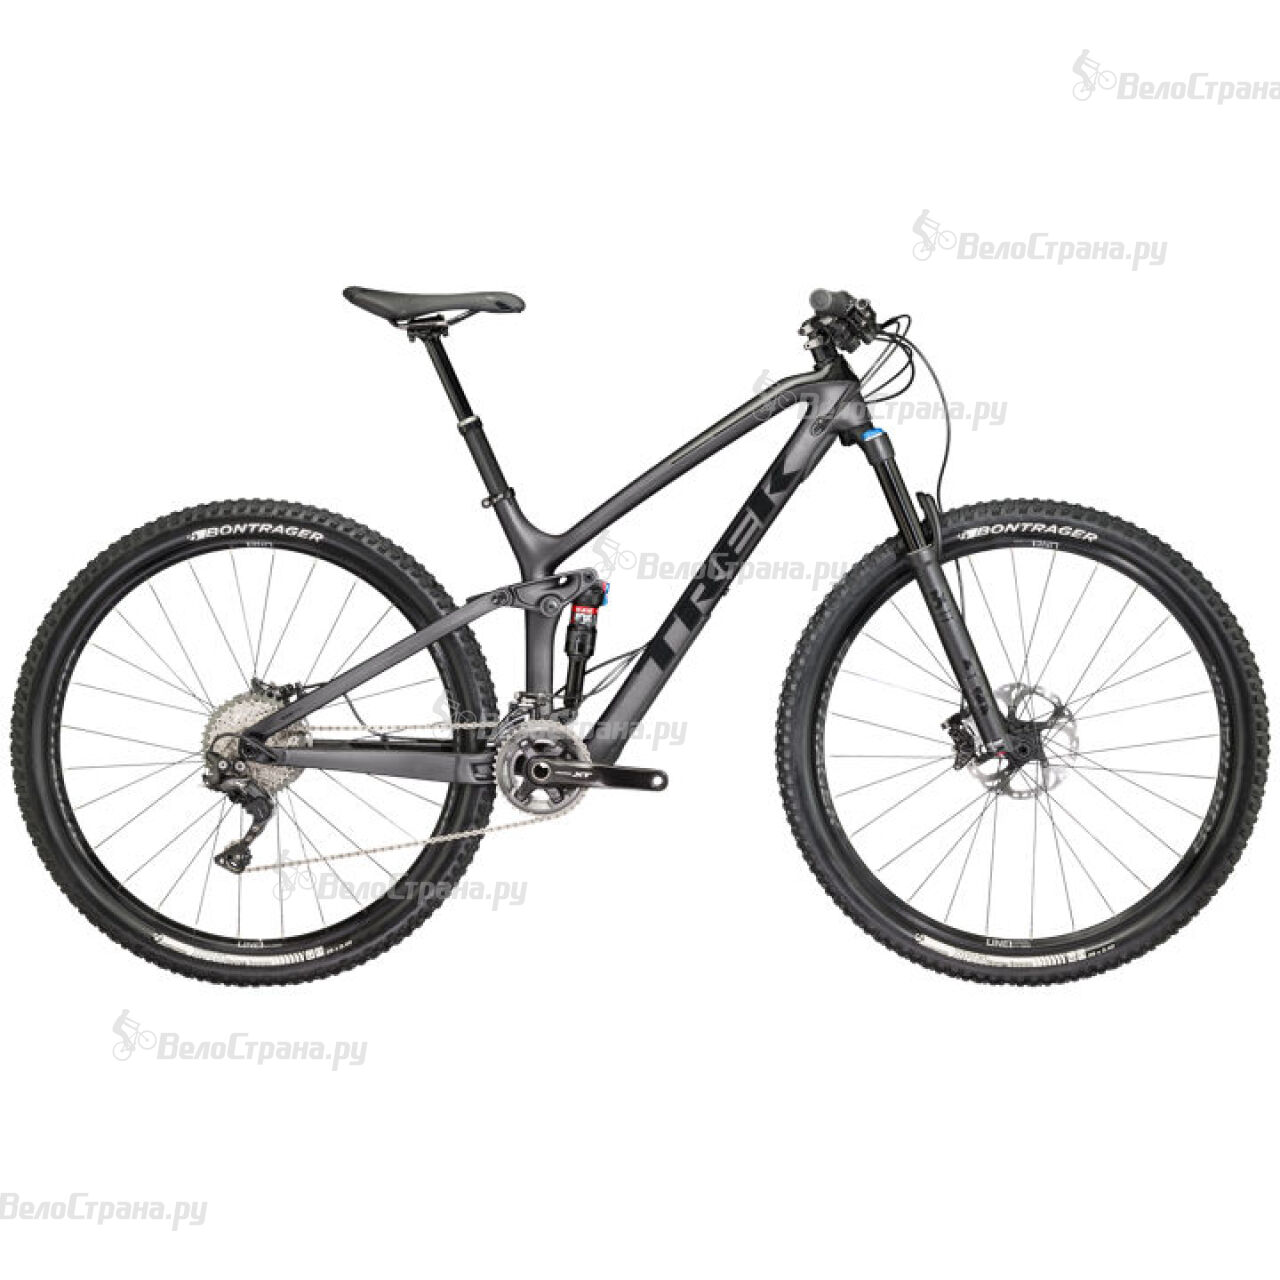 Велосипед Trek Fuel EX 9.8 29 (2017) велосипед trek fuel ex 9 29 2017